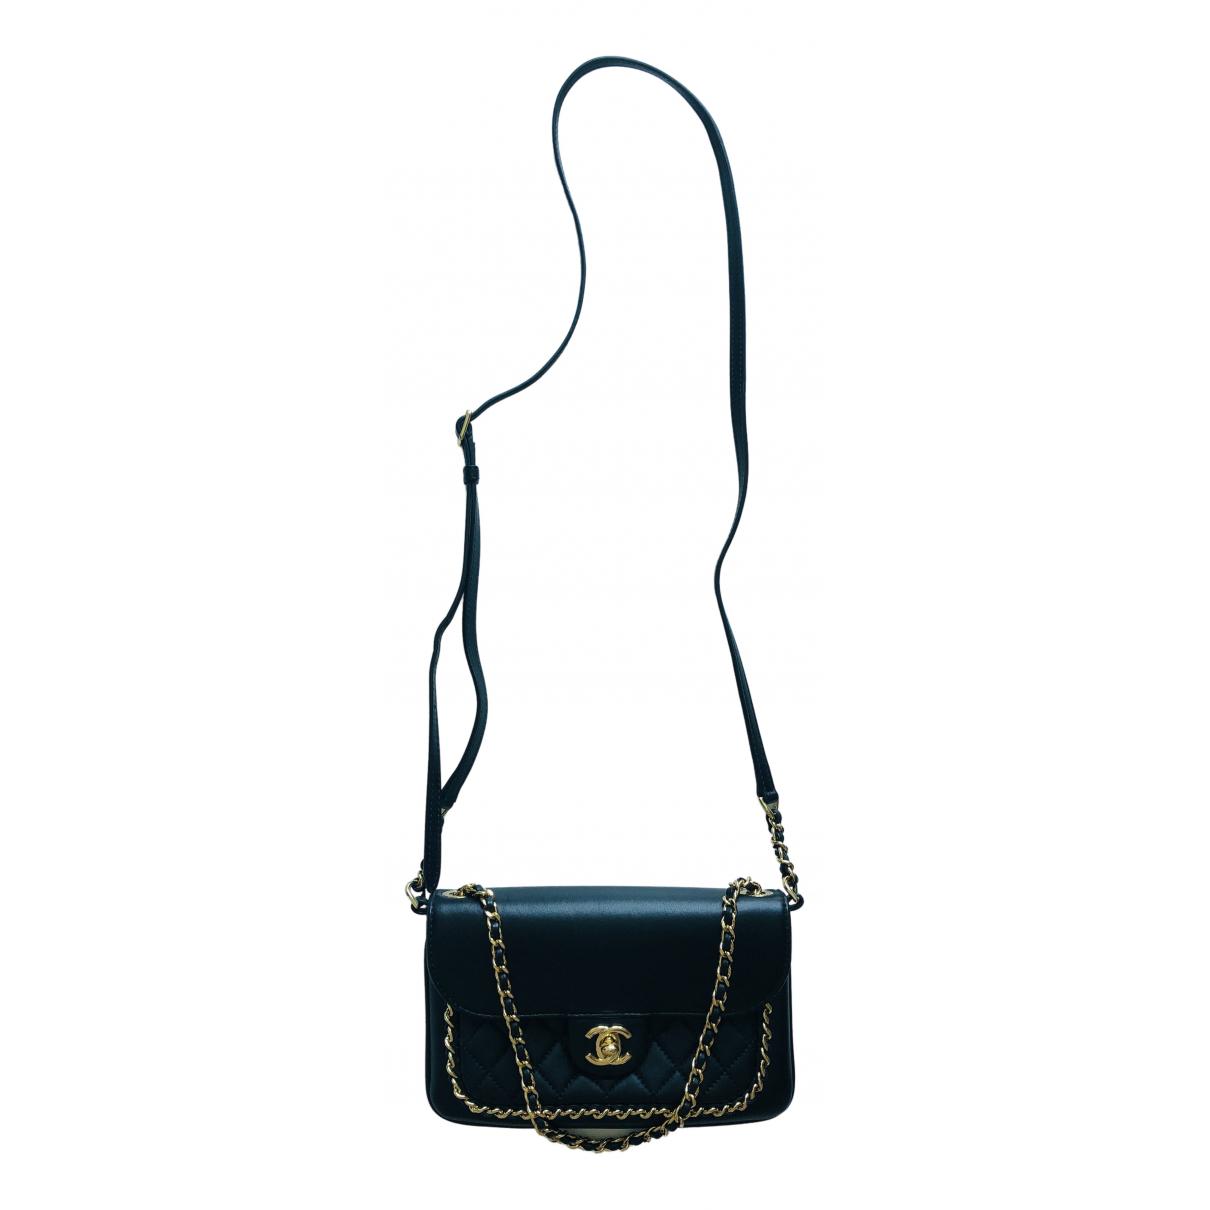 Chanel \N Black Leather handbag for Women \N